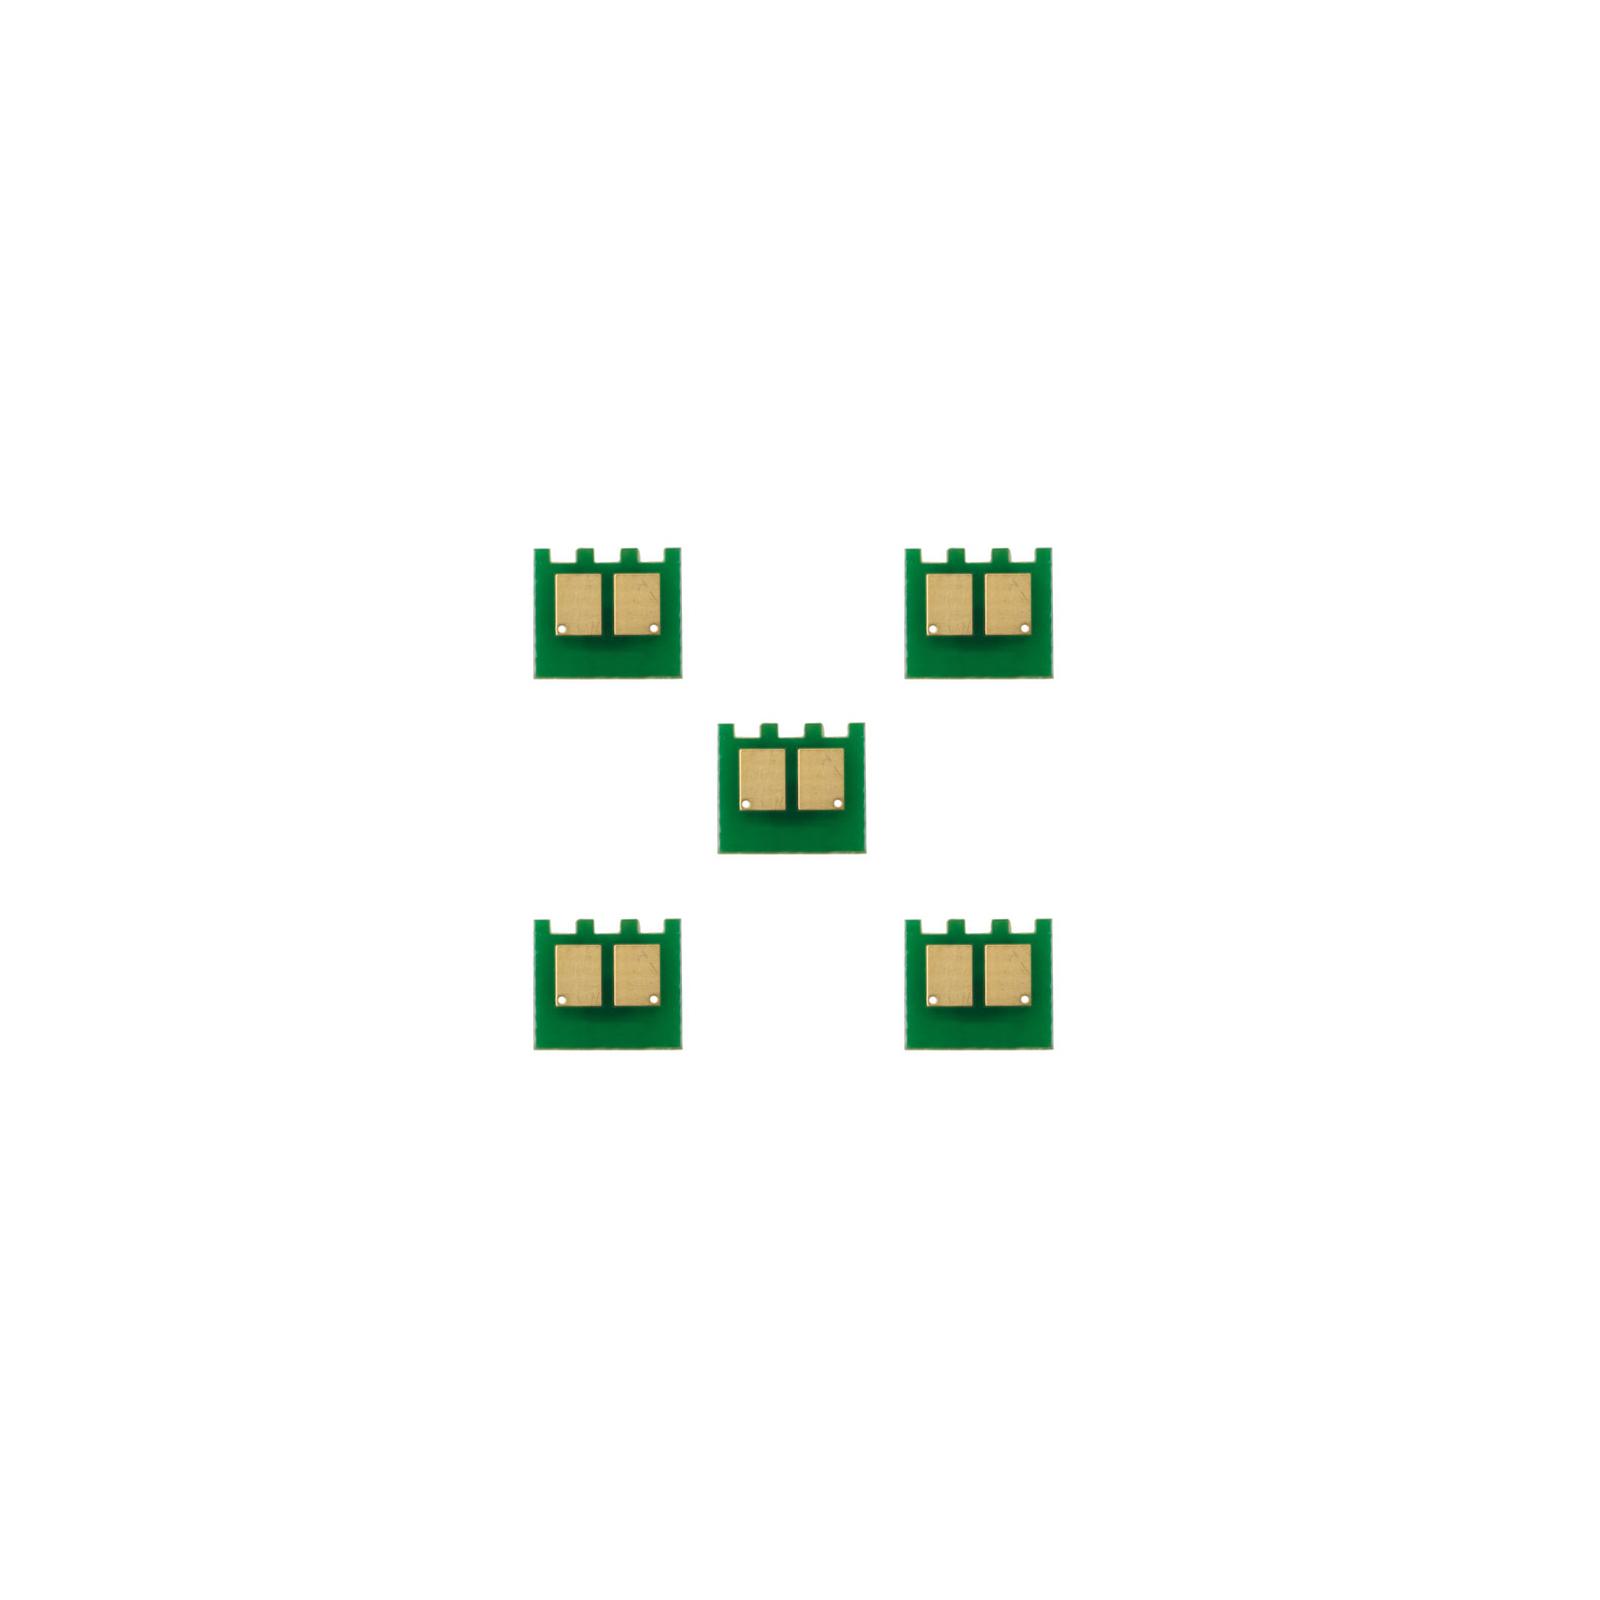 Чип для картриджа HP CLJ Pro M476 (CF381A) 2.7k cyan Static Control (H476CP-C)